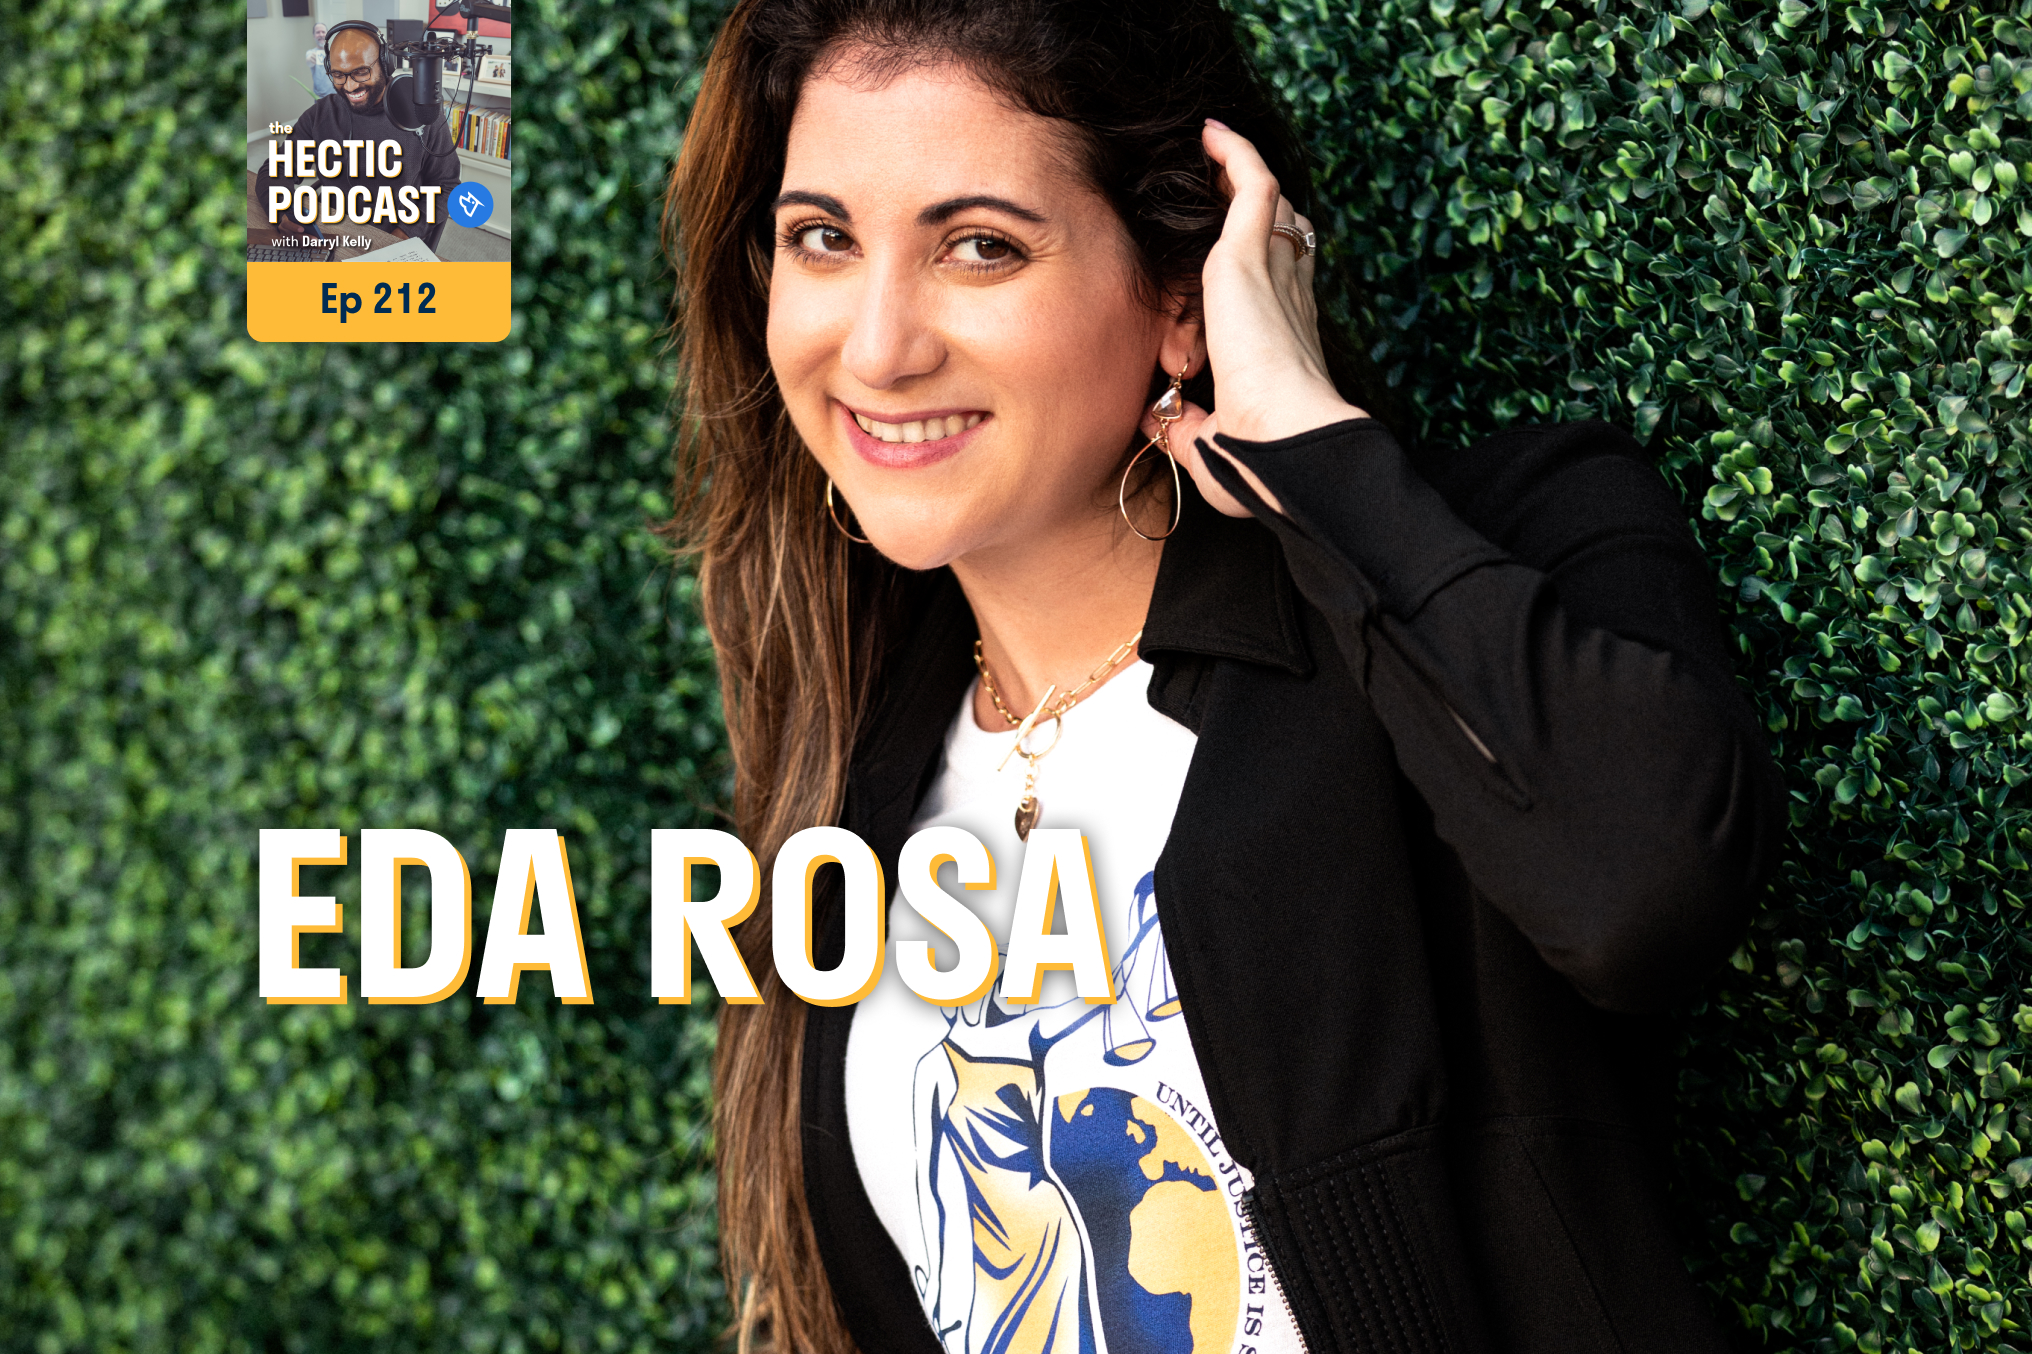 Eda Rosa